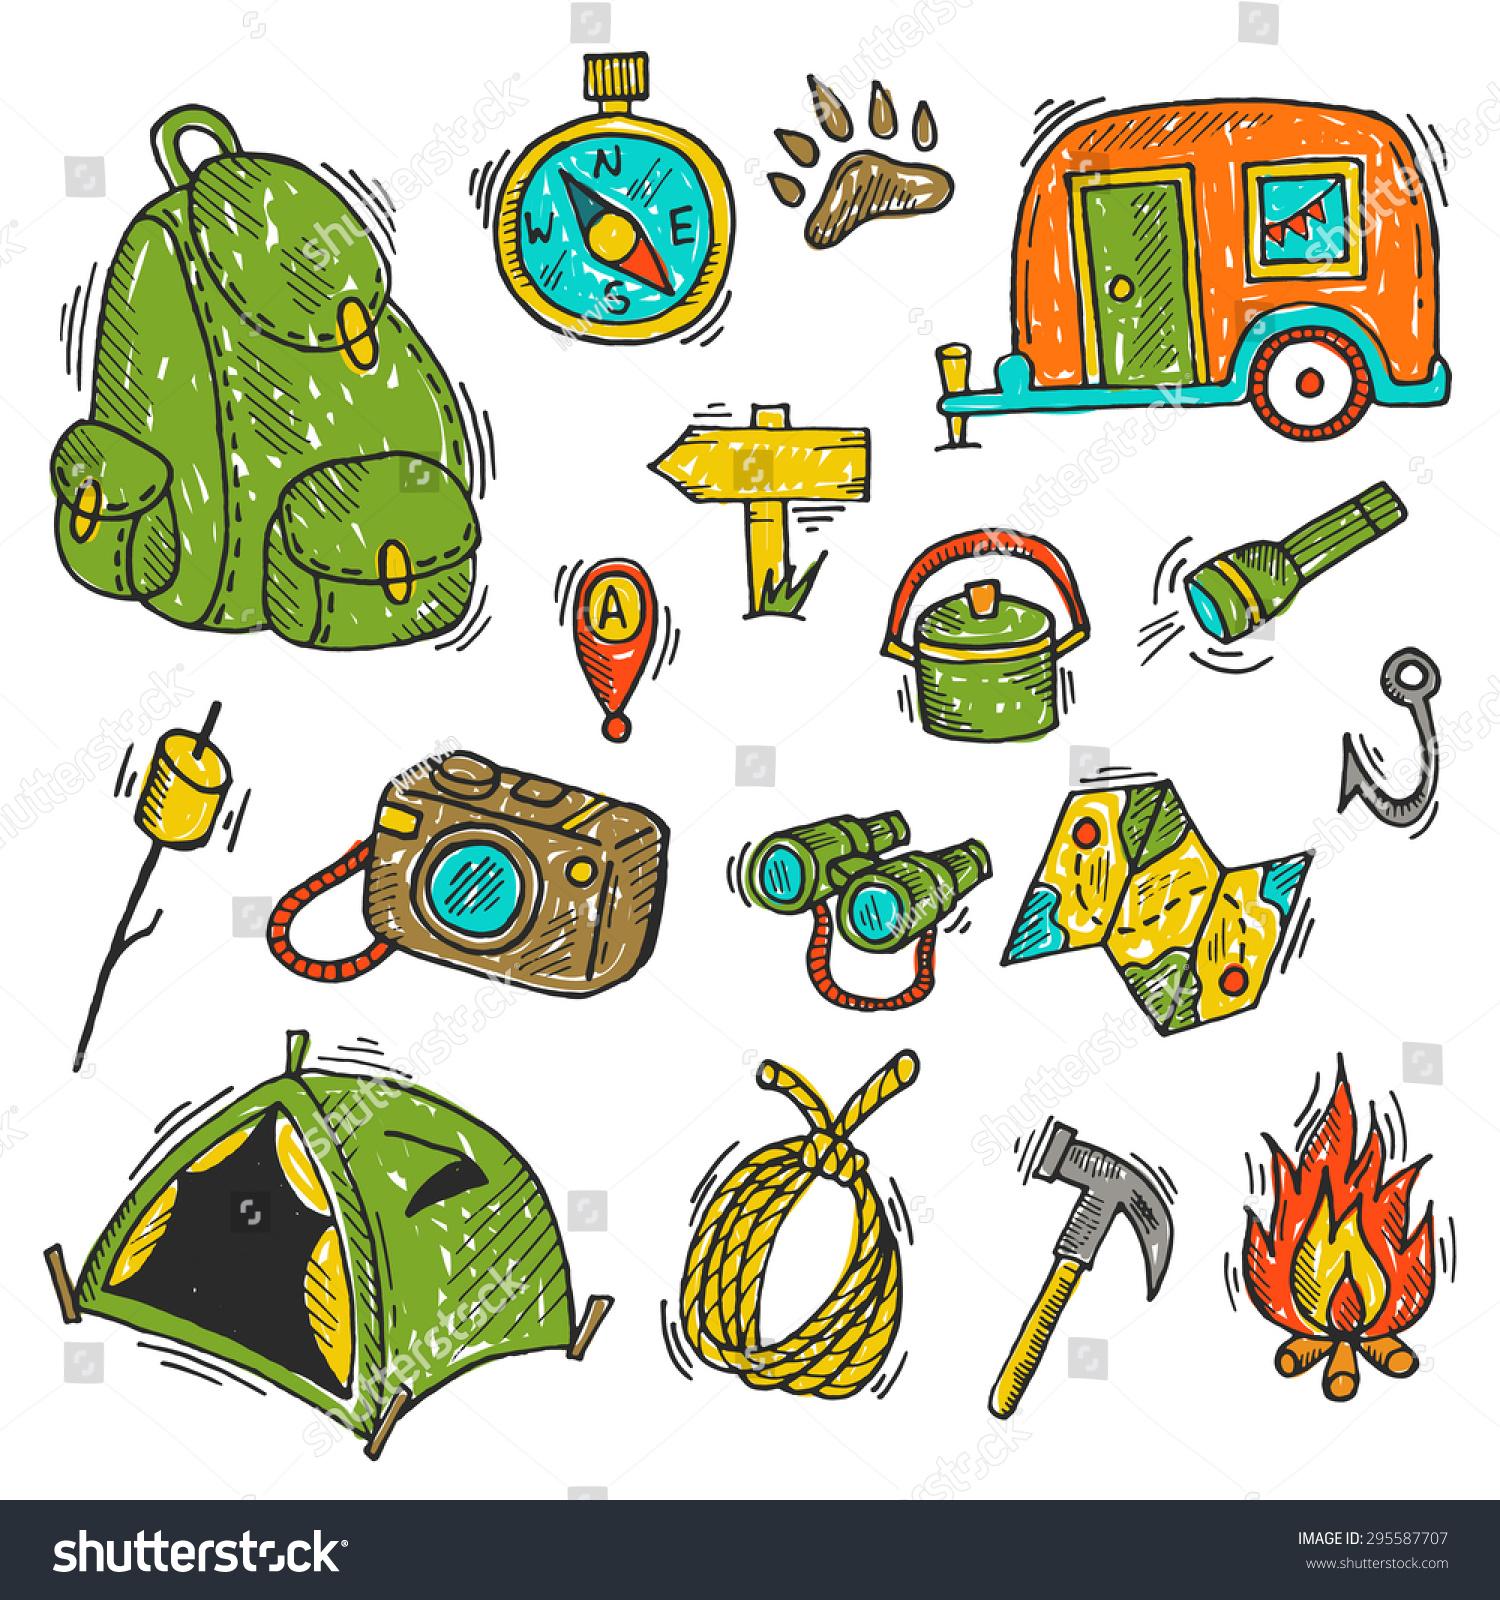 Camping flashlight clipart